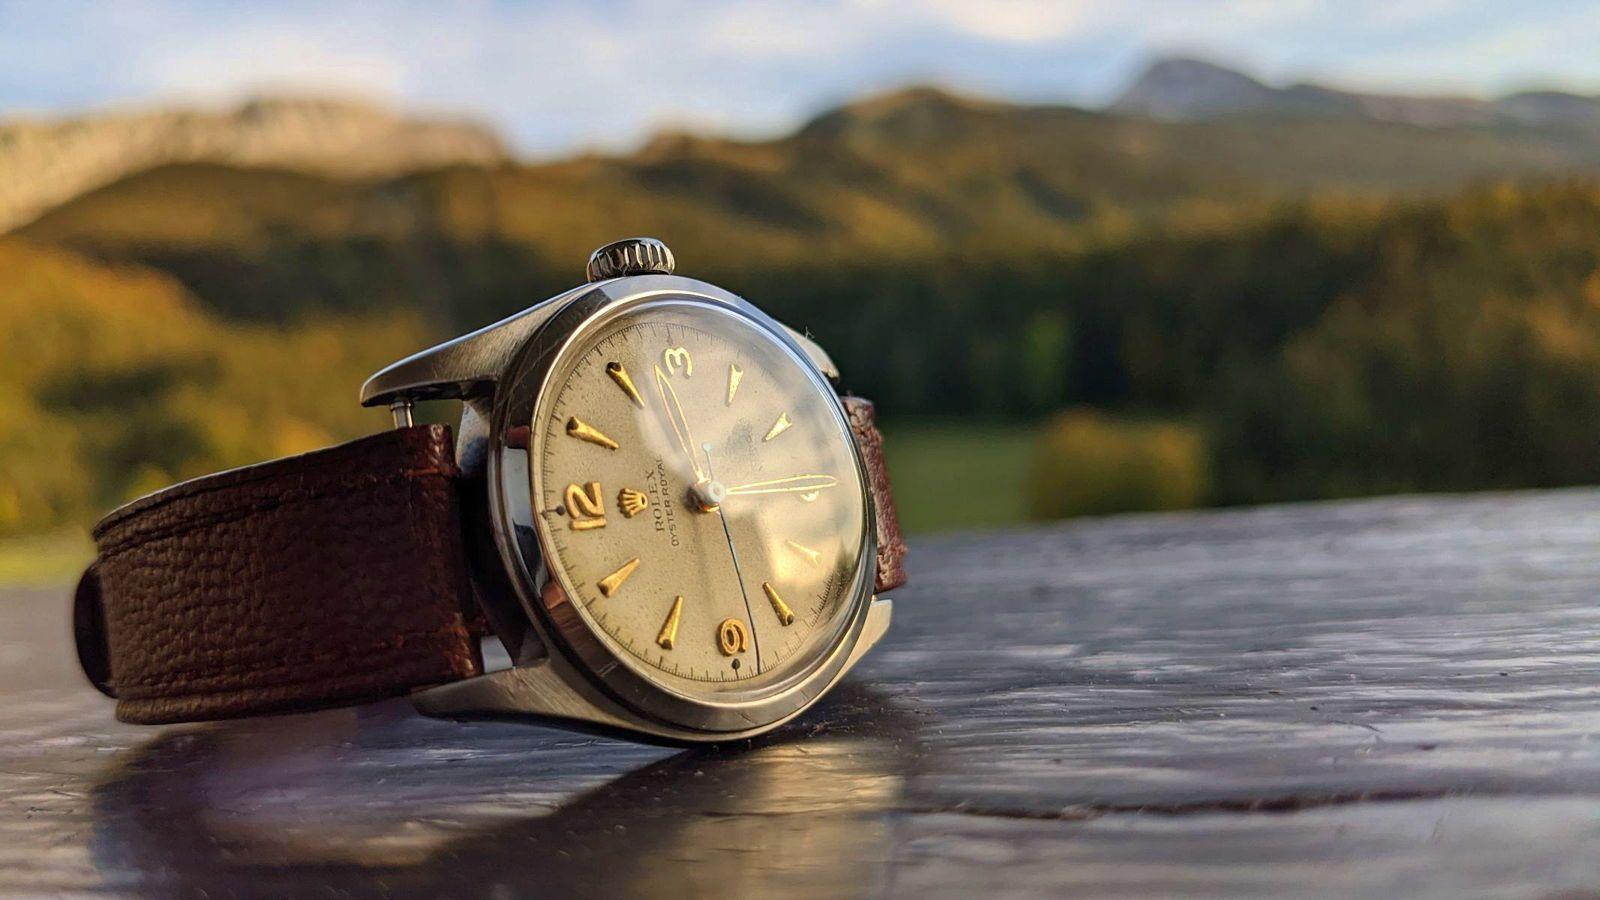 Rolex, Oyster Royal, montre, homme